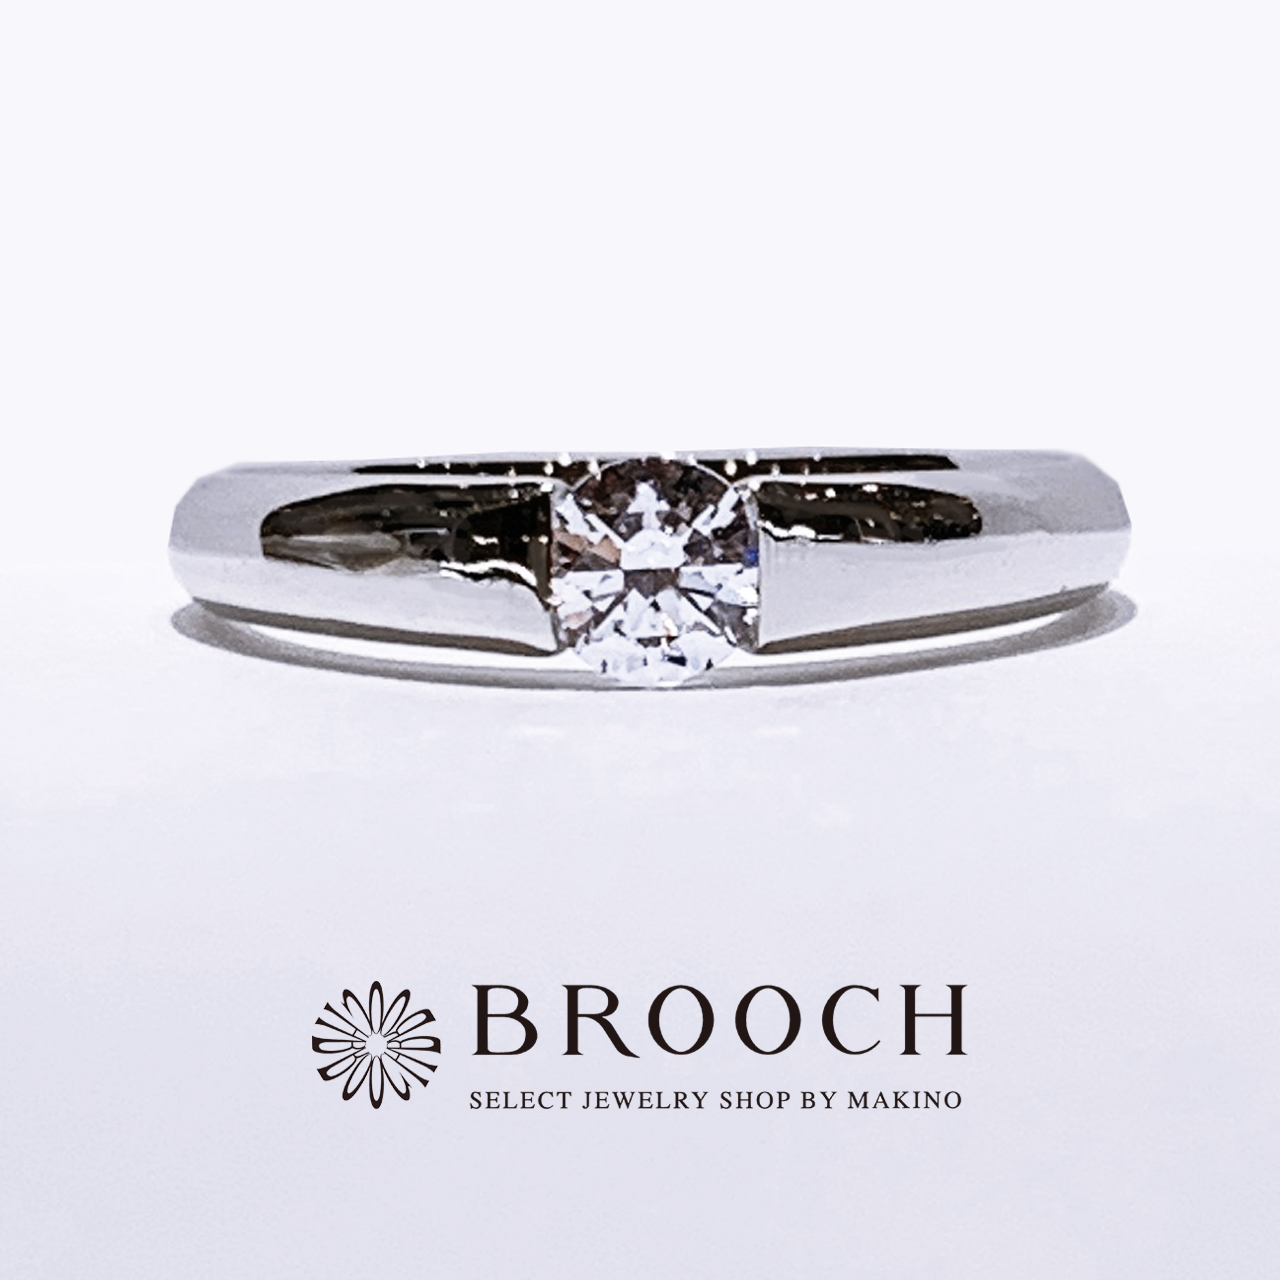 BROOCH 婚約指輪 エンゲージリング シンプルストレート1石デザイン